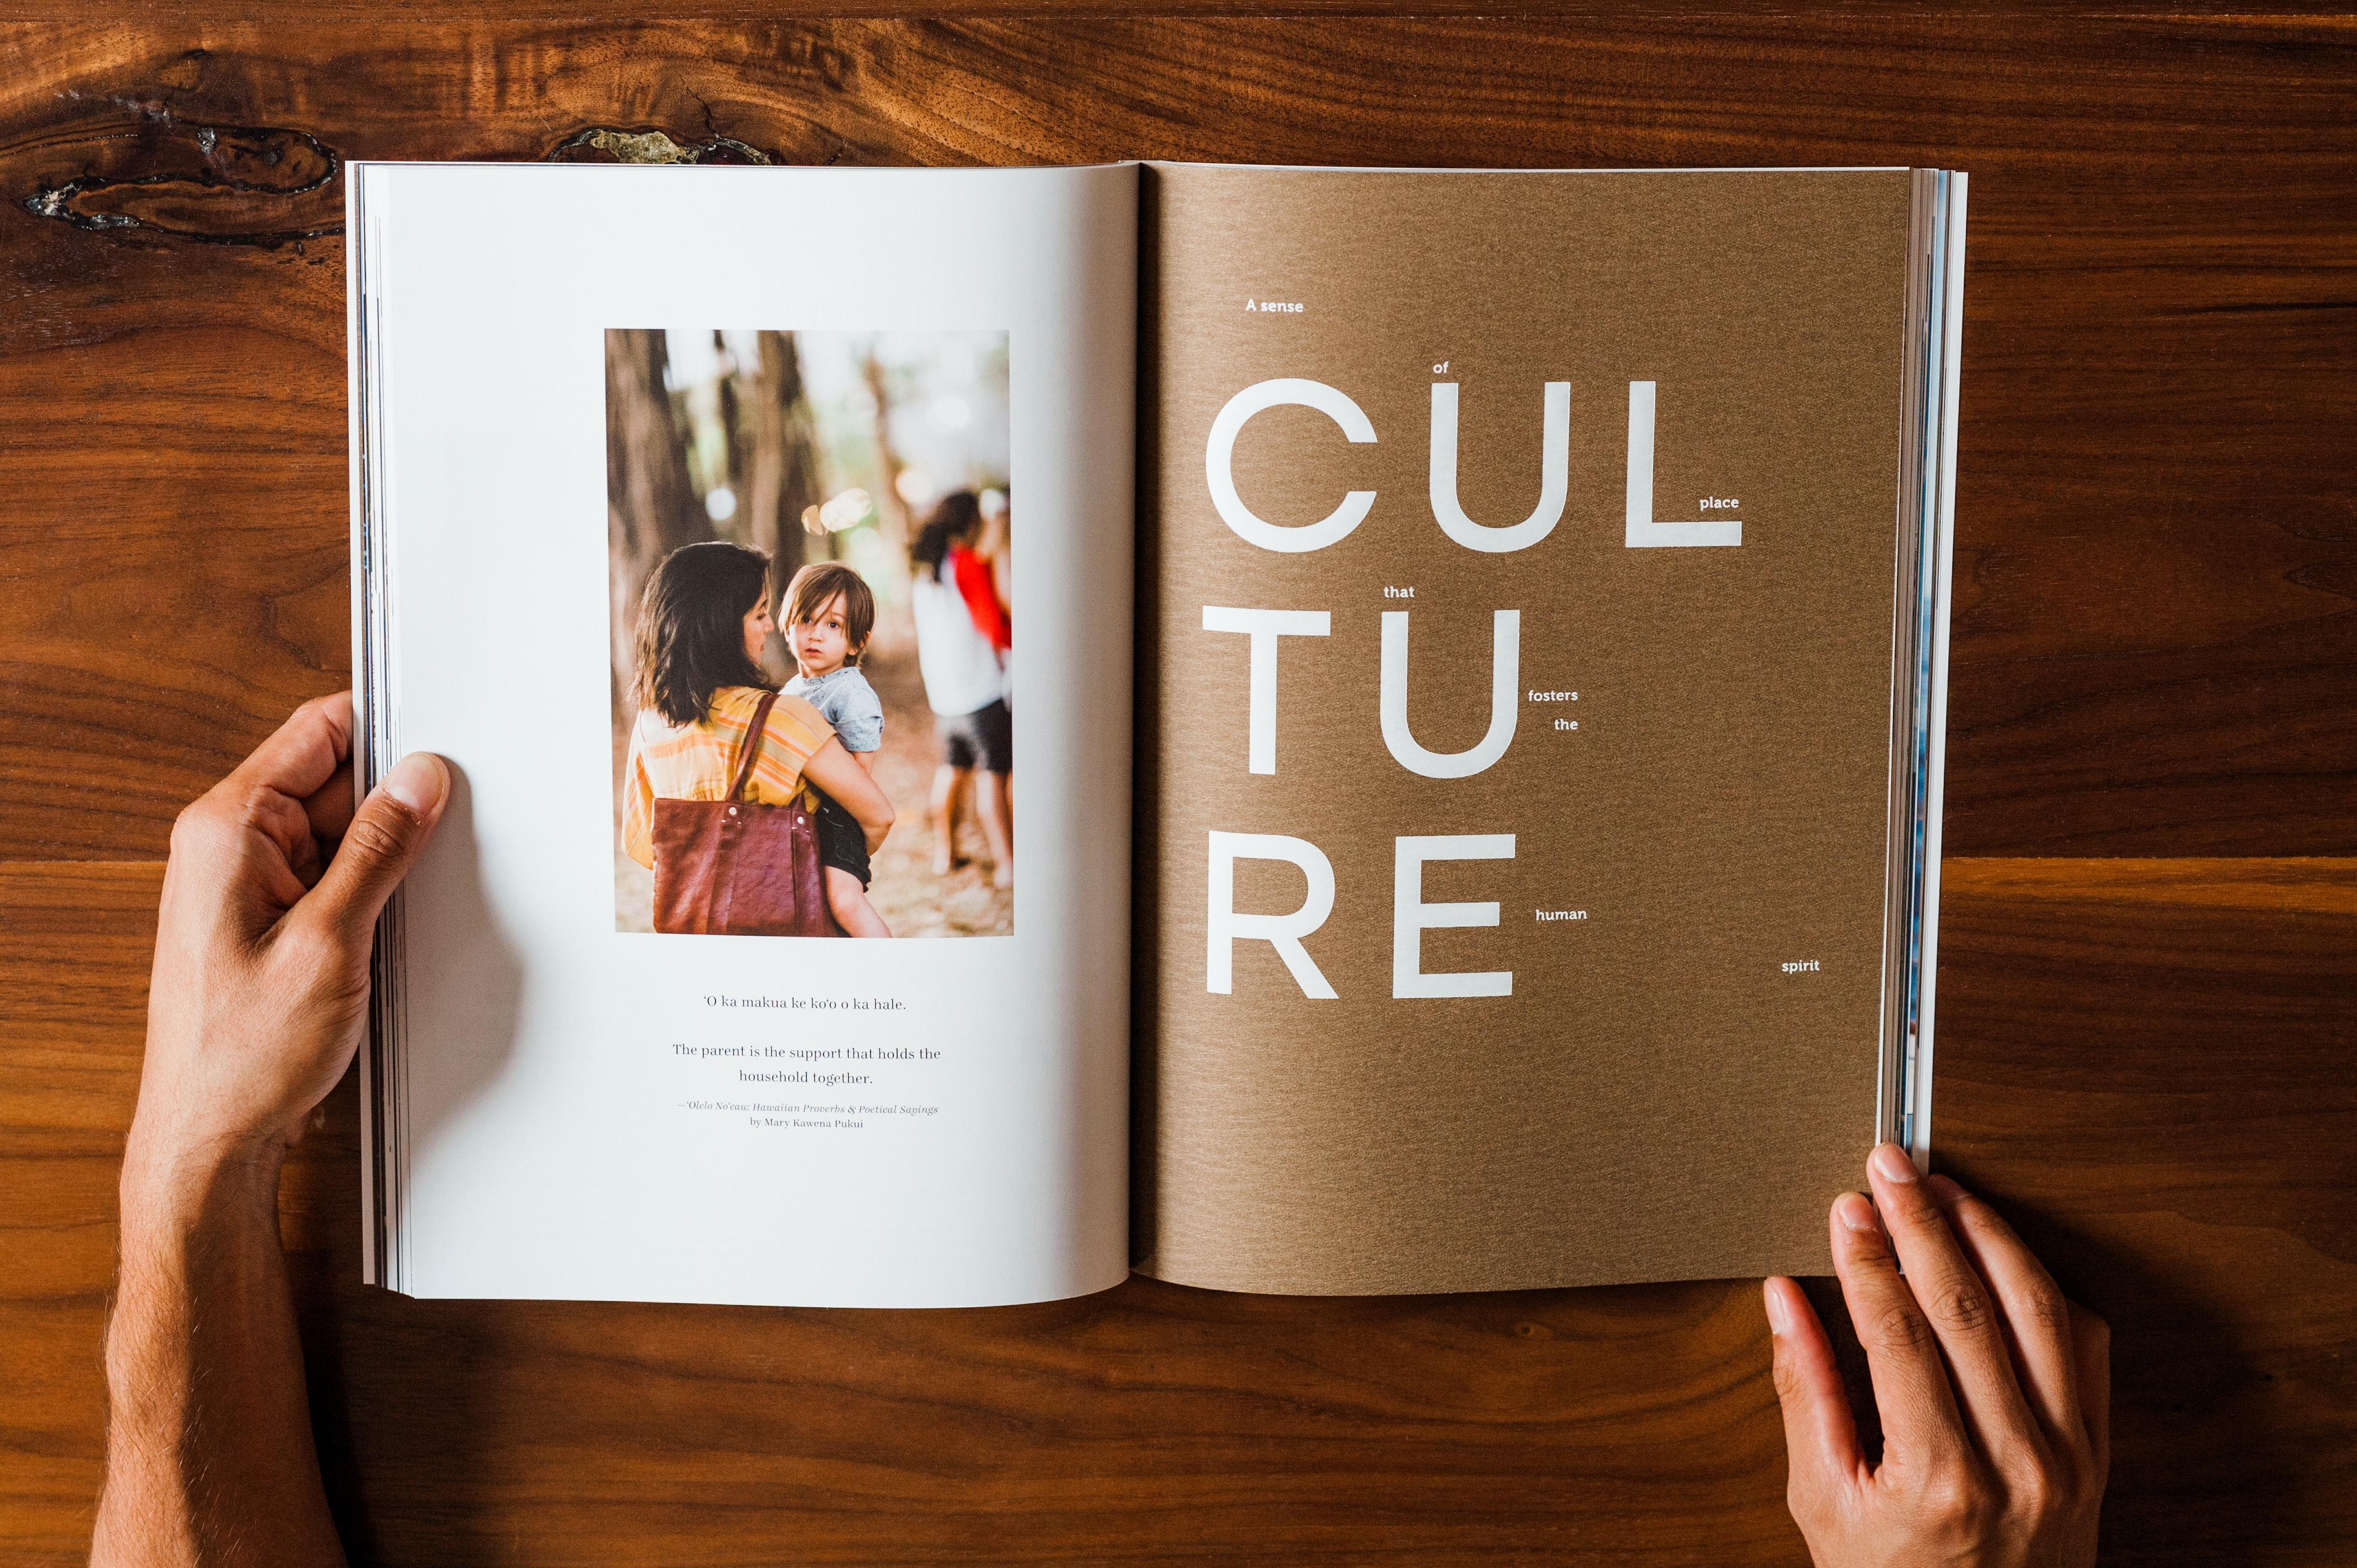 Kulttuurivienti